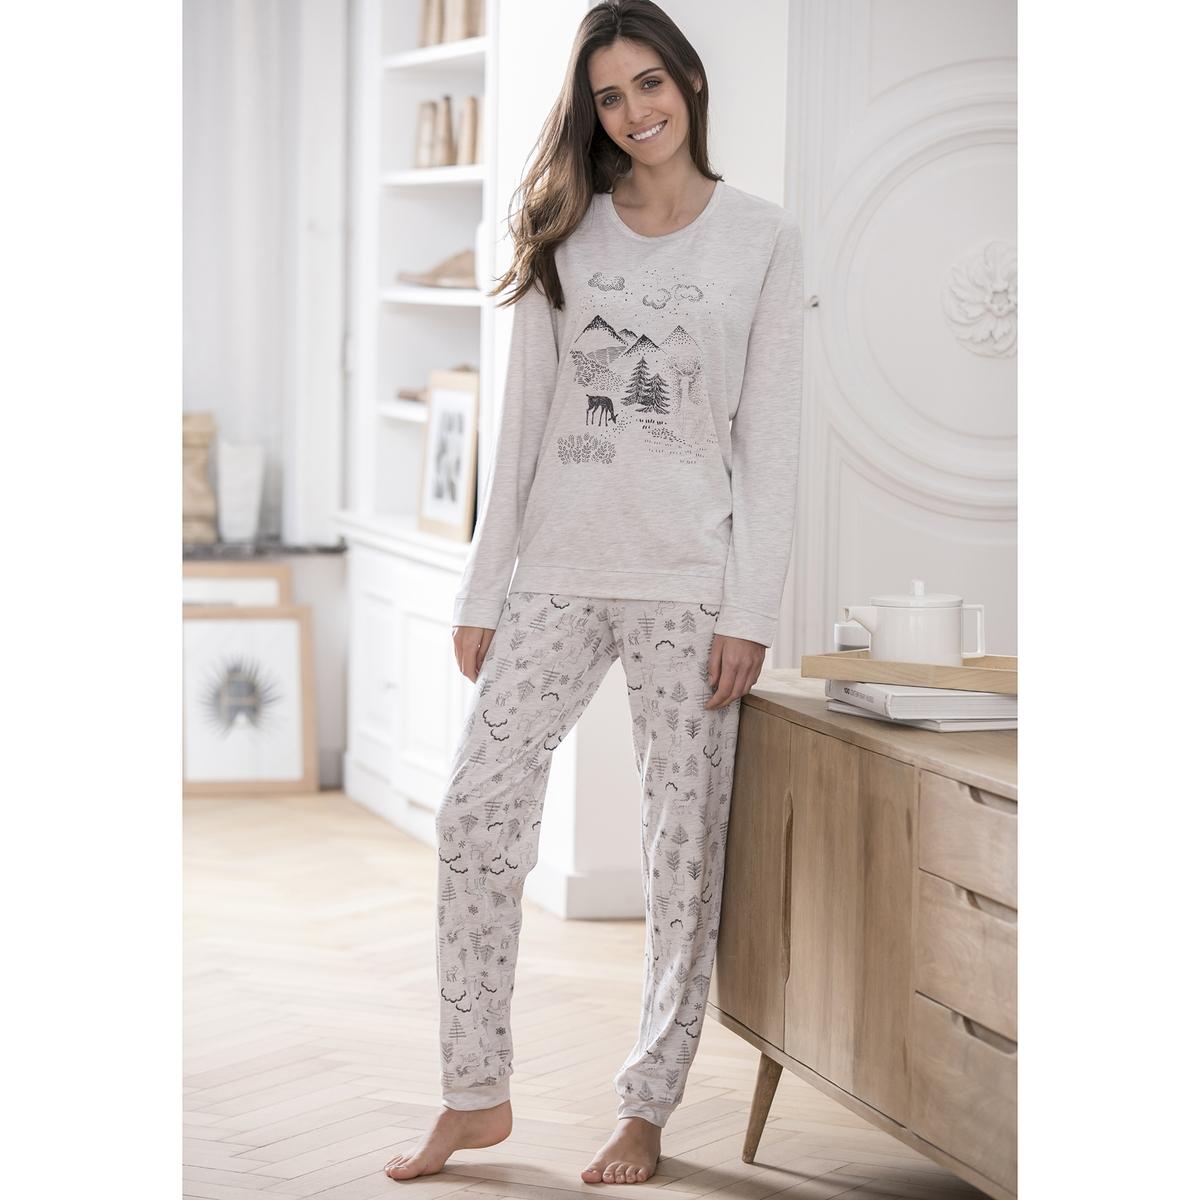 Пижама с длинными рукавами thermolactyl® тапки войлочные thermolactyl®